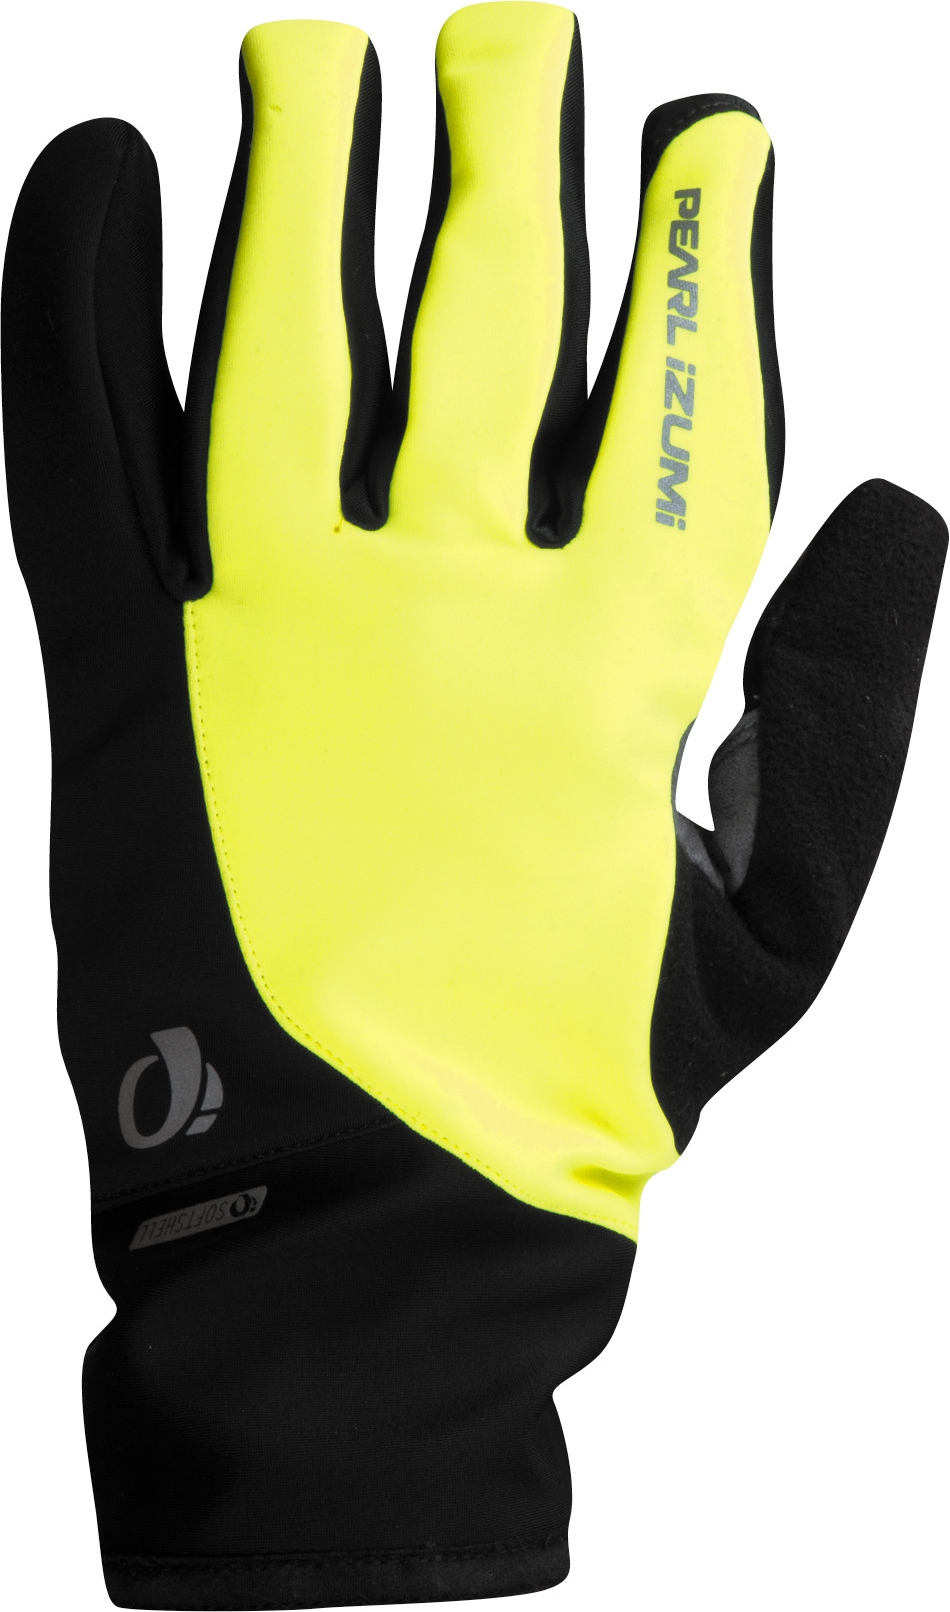 pearl izumi select softshell glove screaming yellow. Black Bedroom Furniture Sets. Home Design Ideas